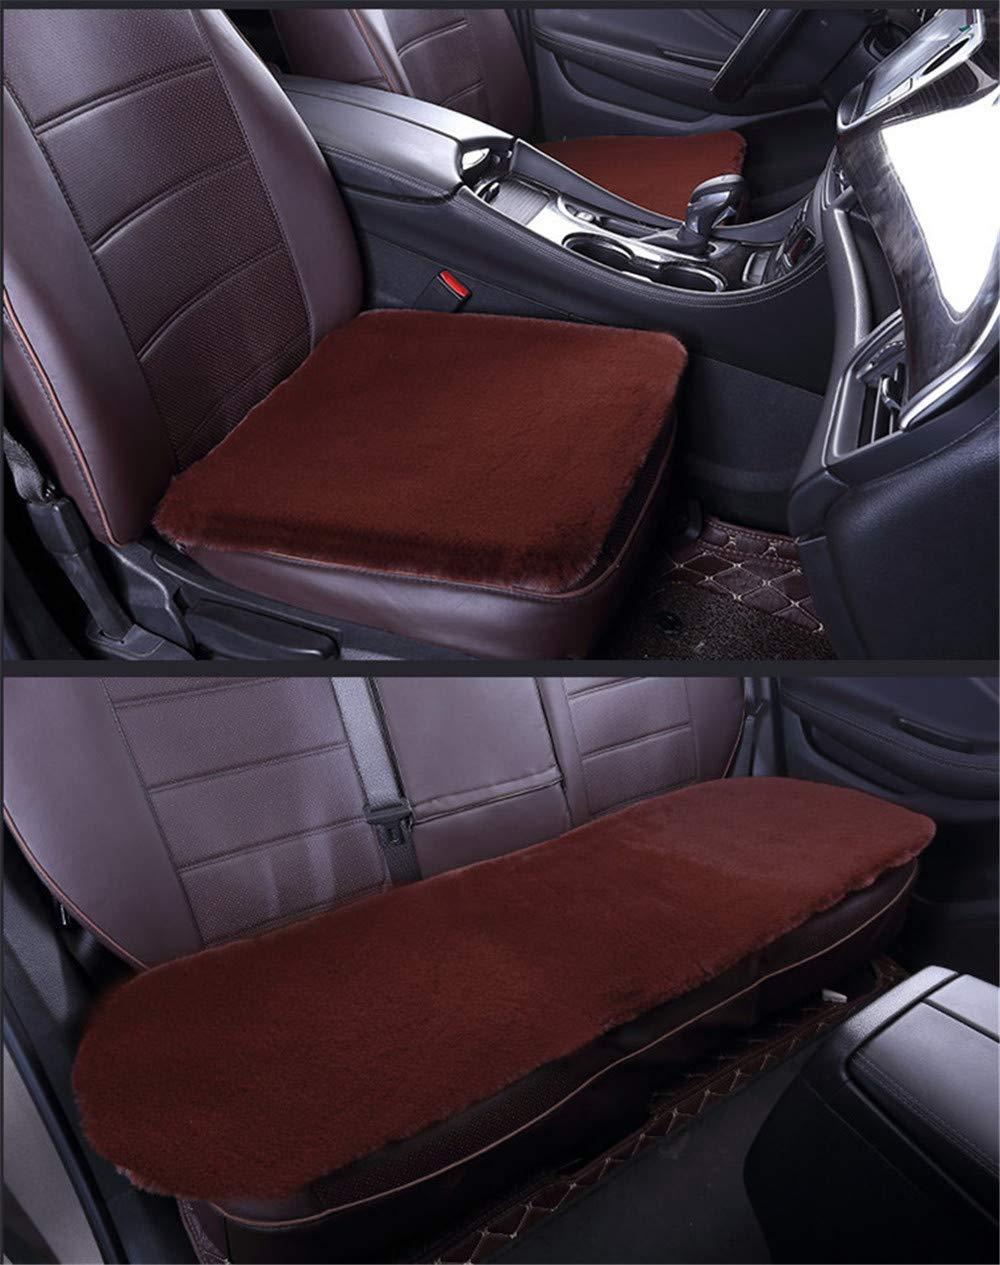 Universal Auto Sitzbezug Autositzauflage Sitzkissen Lammfell Sitzauflage Stuhlauflage Schaffell Kissen f/ürs Auto Rollstuhlauflage sch/ön Schwarz,3PCS